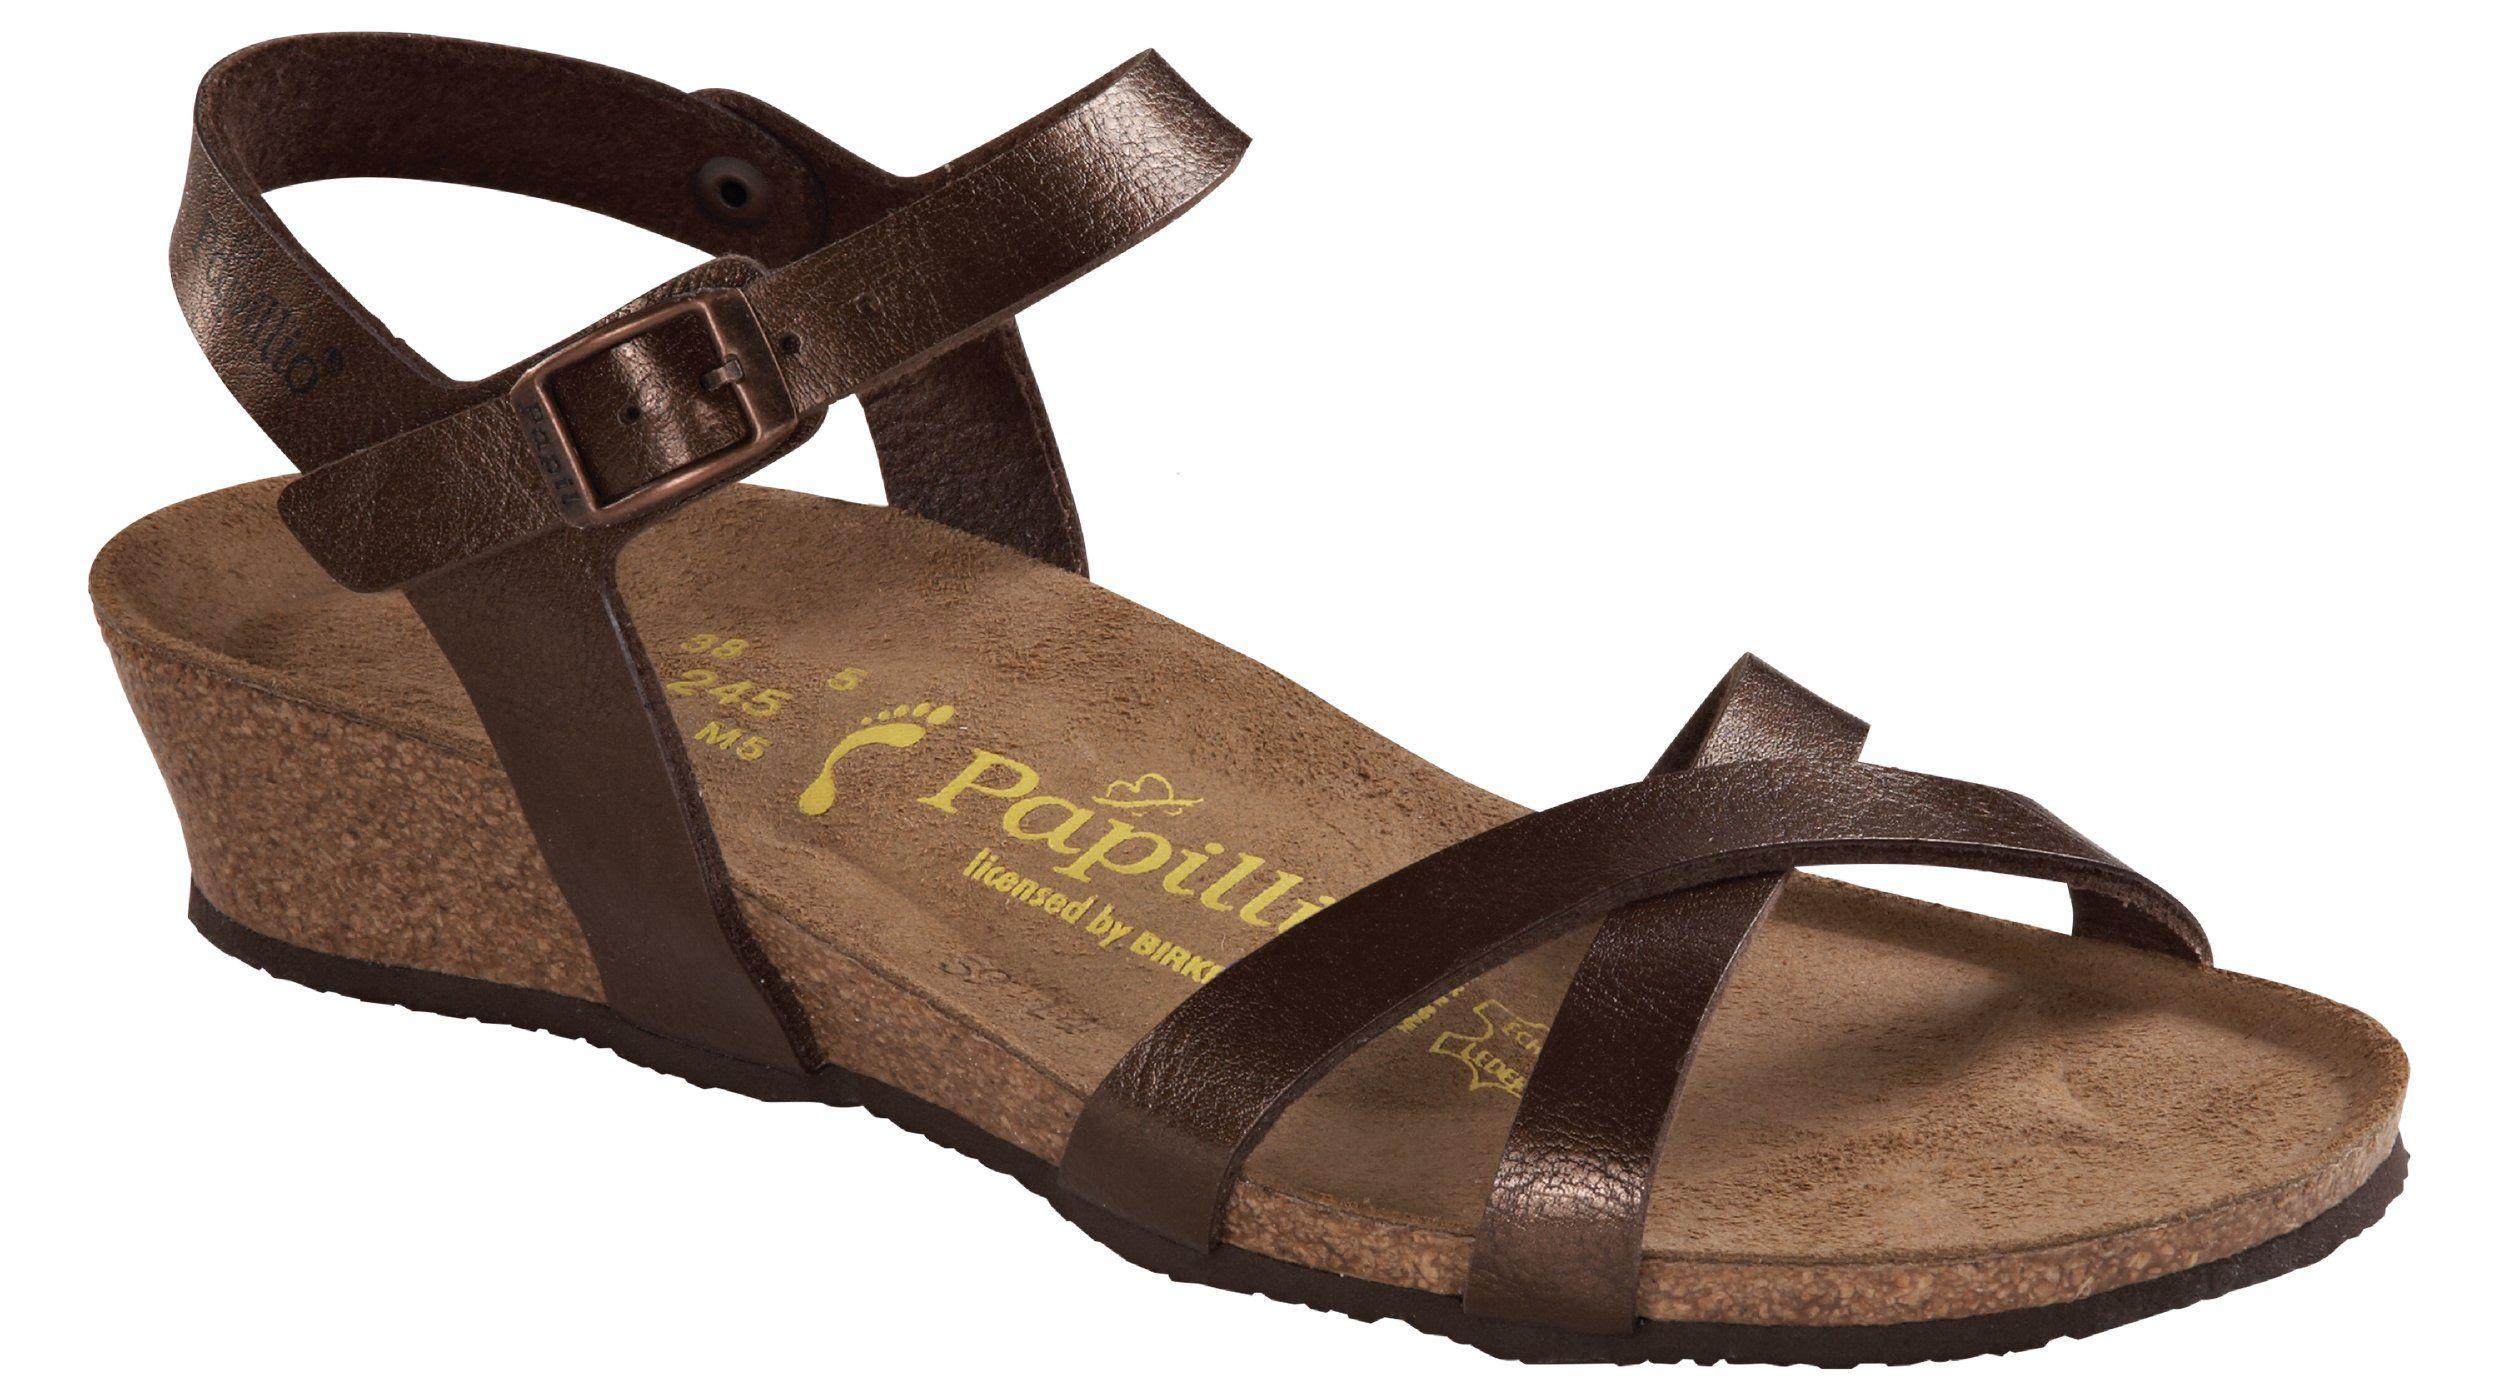 Naturalizer Nalani Wedge Sandals Brown Womens Sandals Sandals